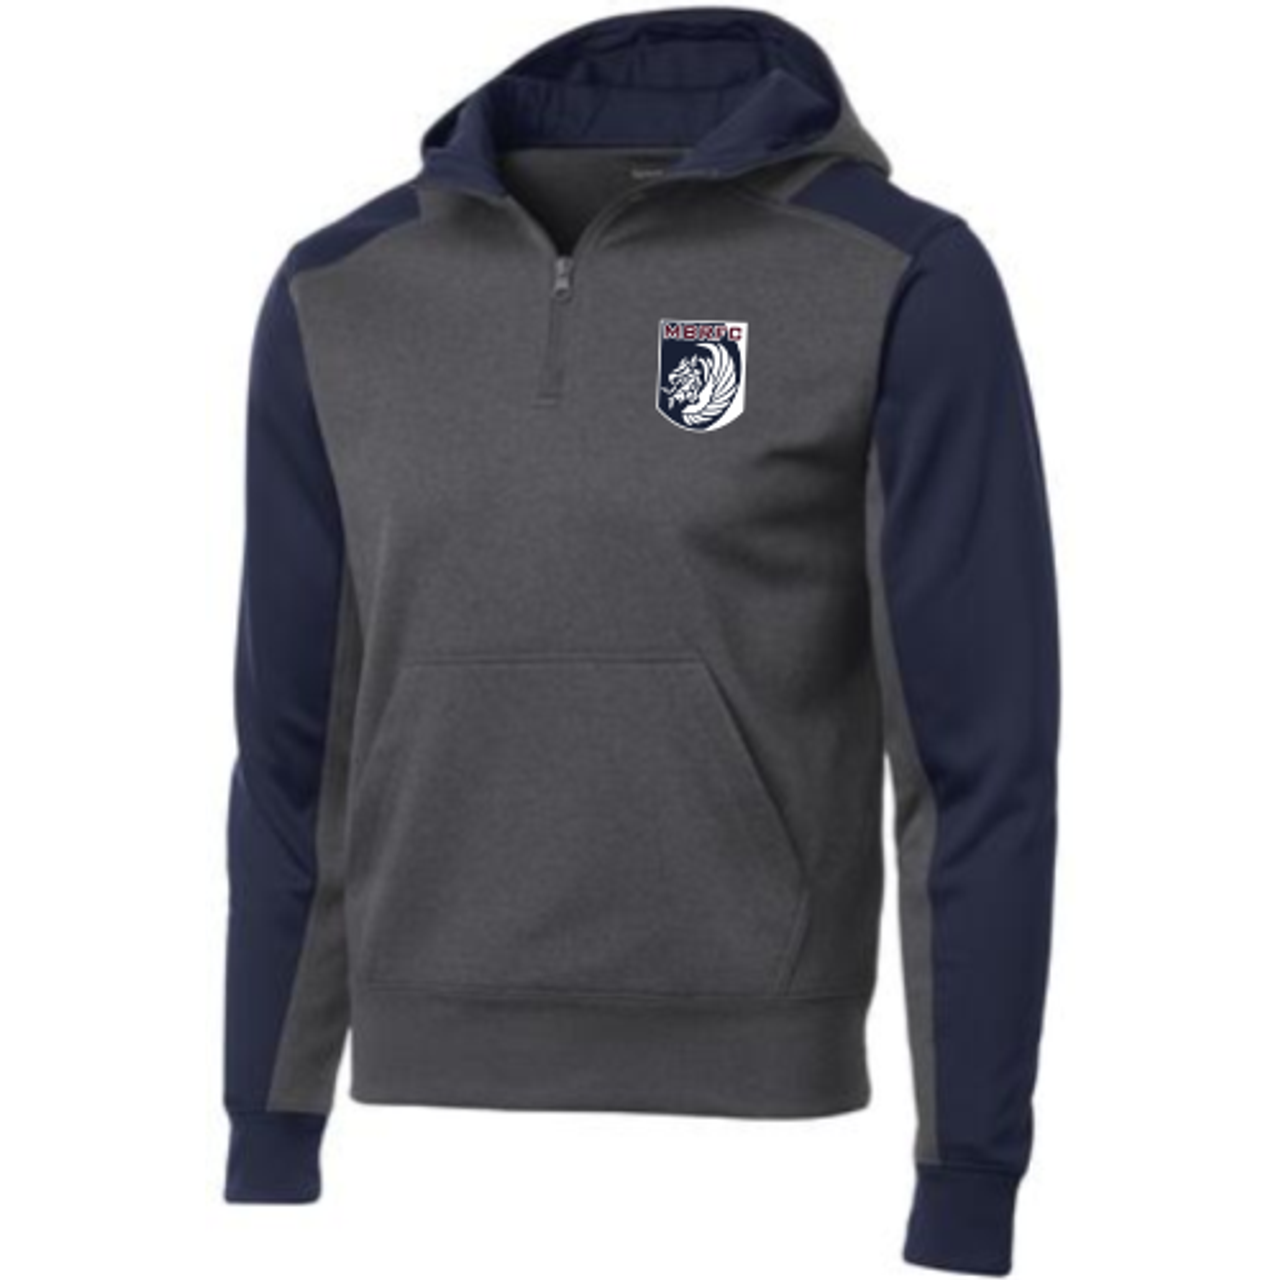 MB Rugby 1/4-Zip Performance Fleece Hoodie